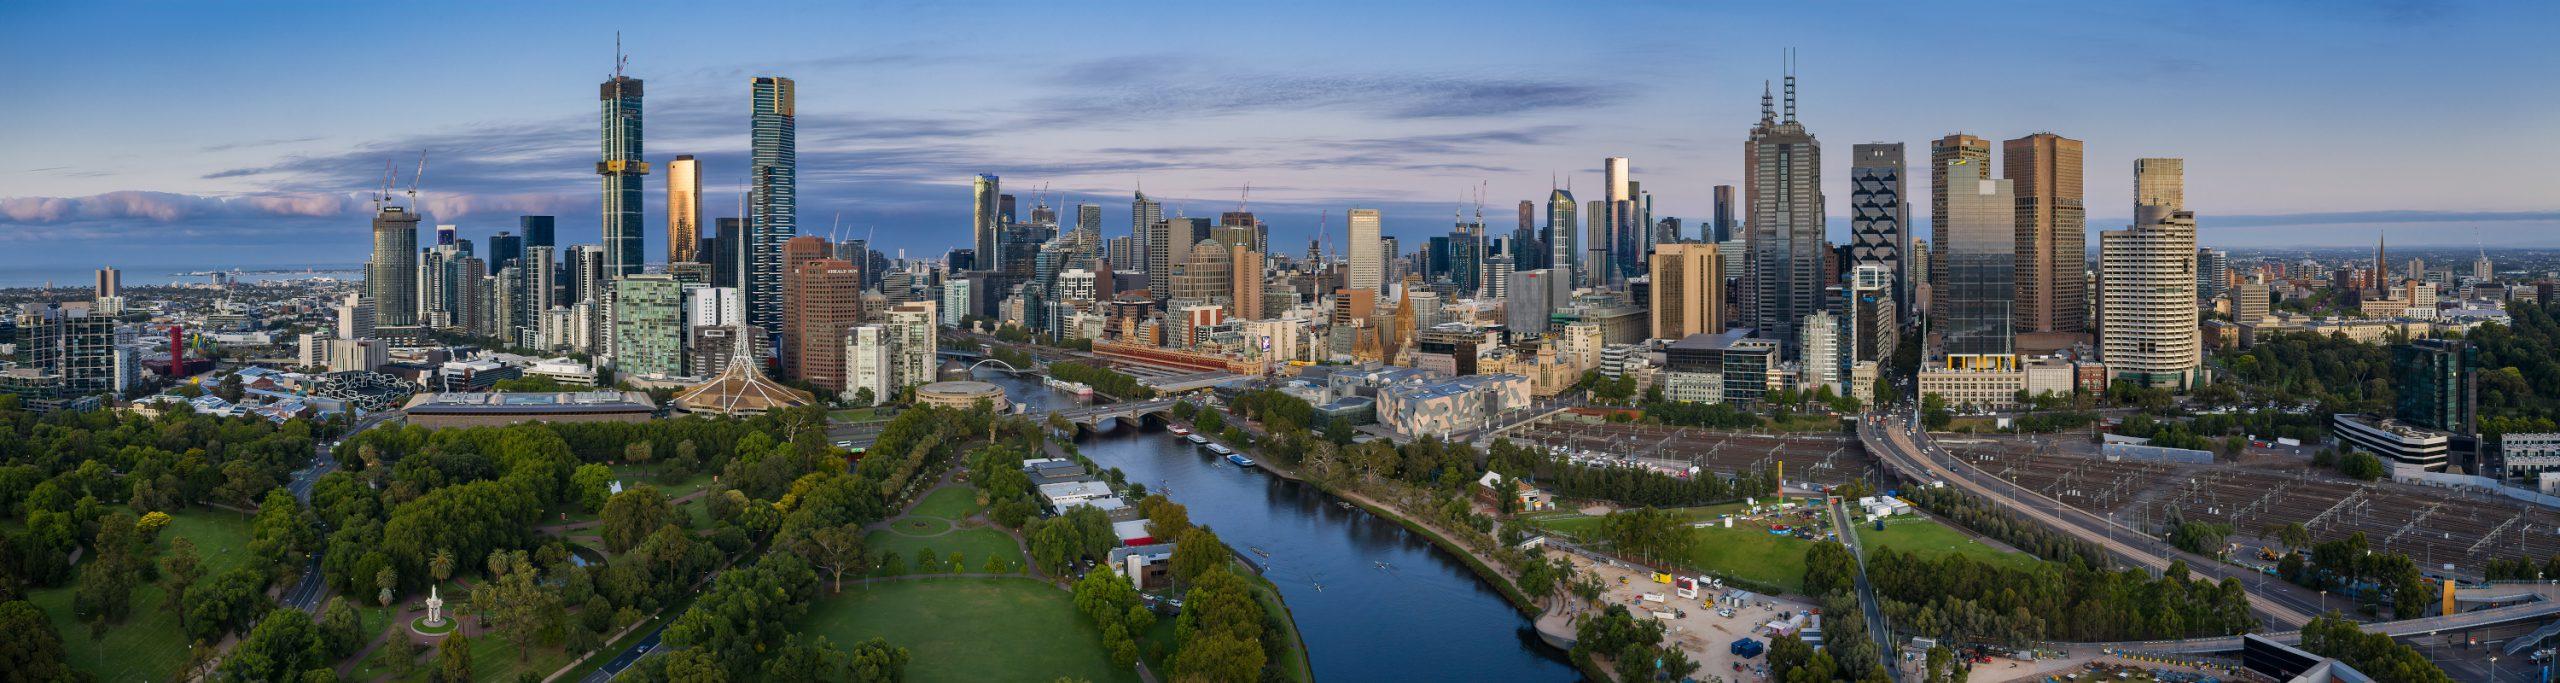 Melbourne Skyline at dawn taken on 02 Feb 2020